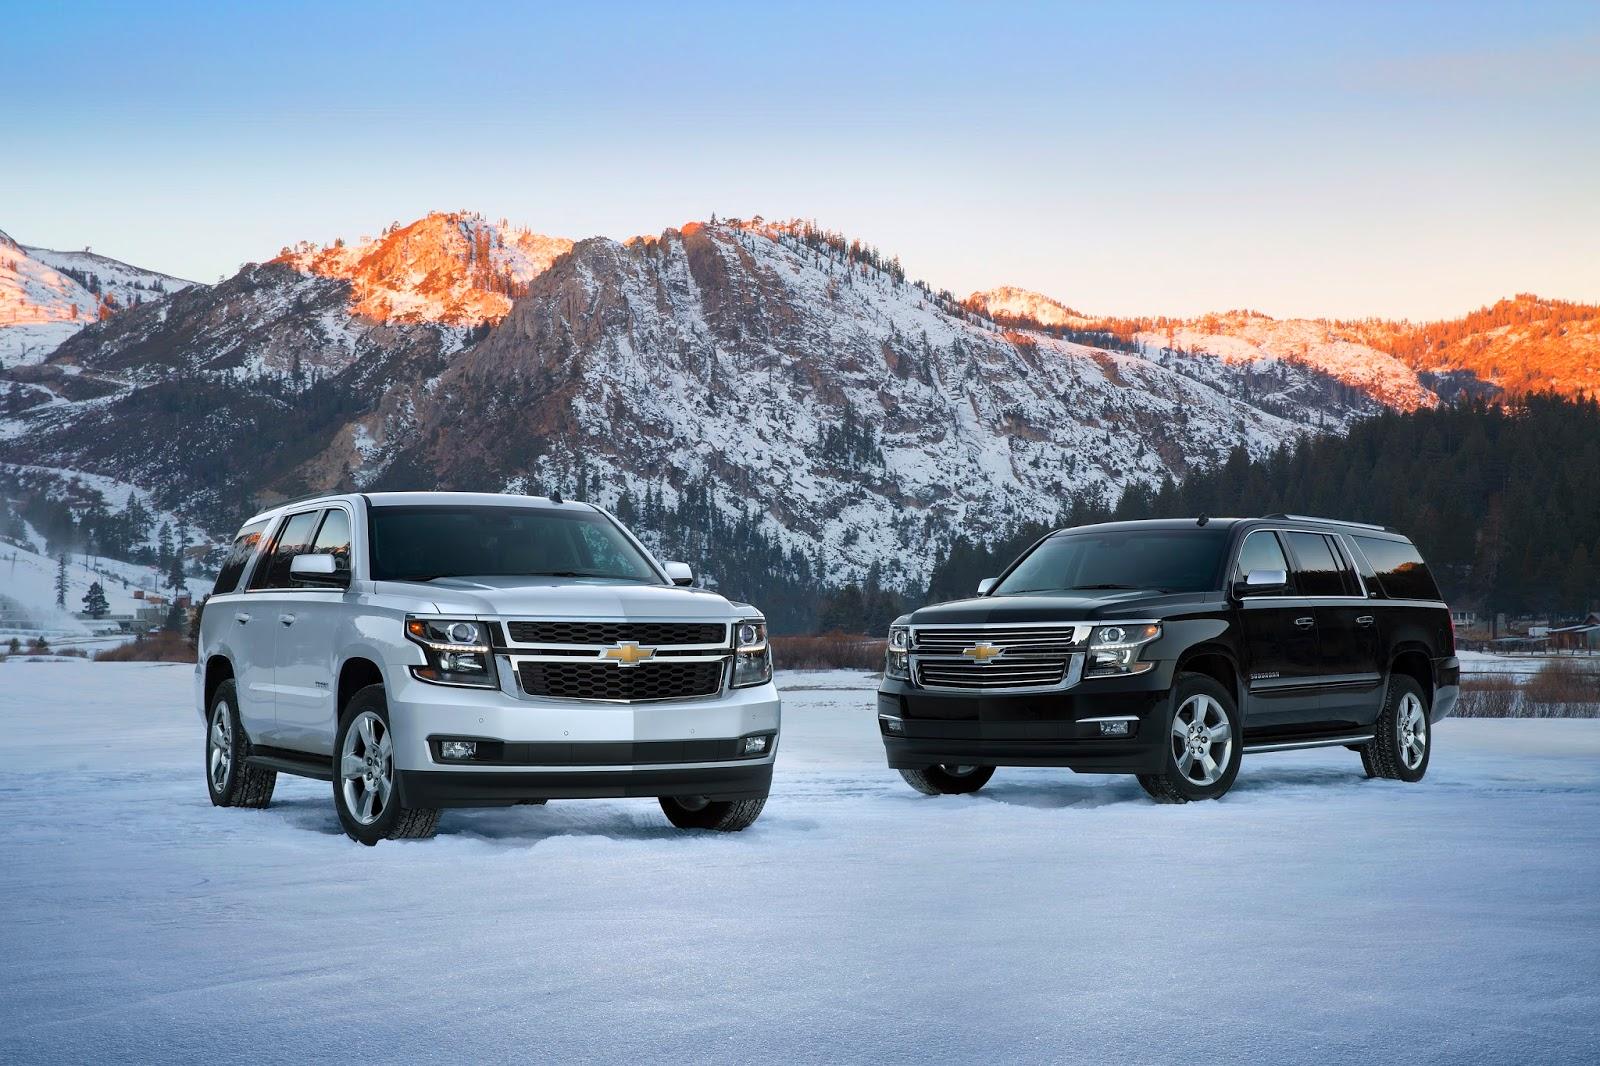 2015 Chevy SUVs Achieve Better Gas Mileage